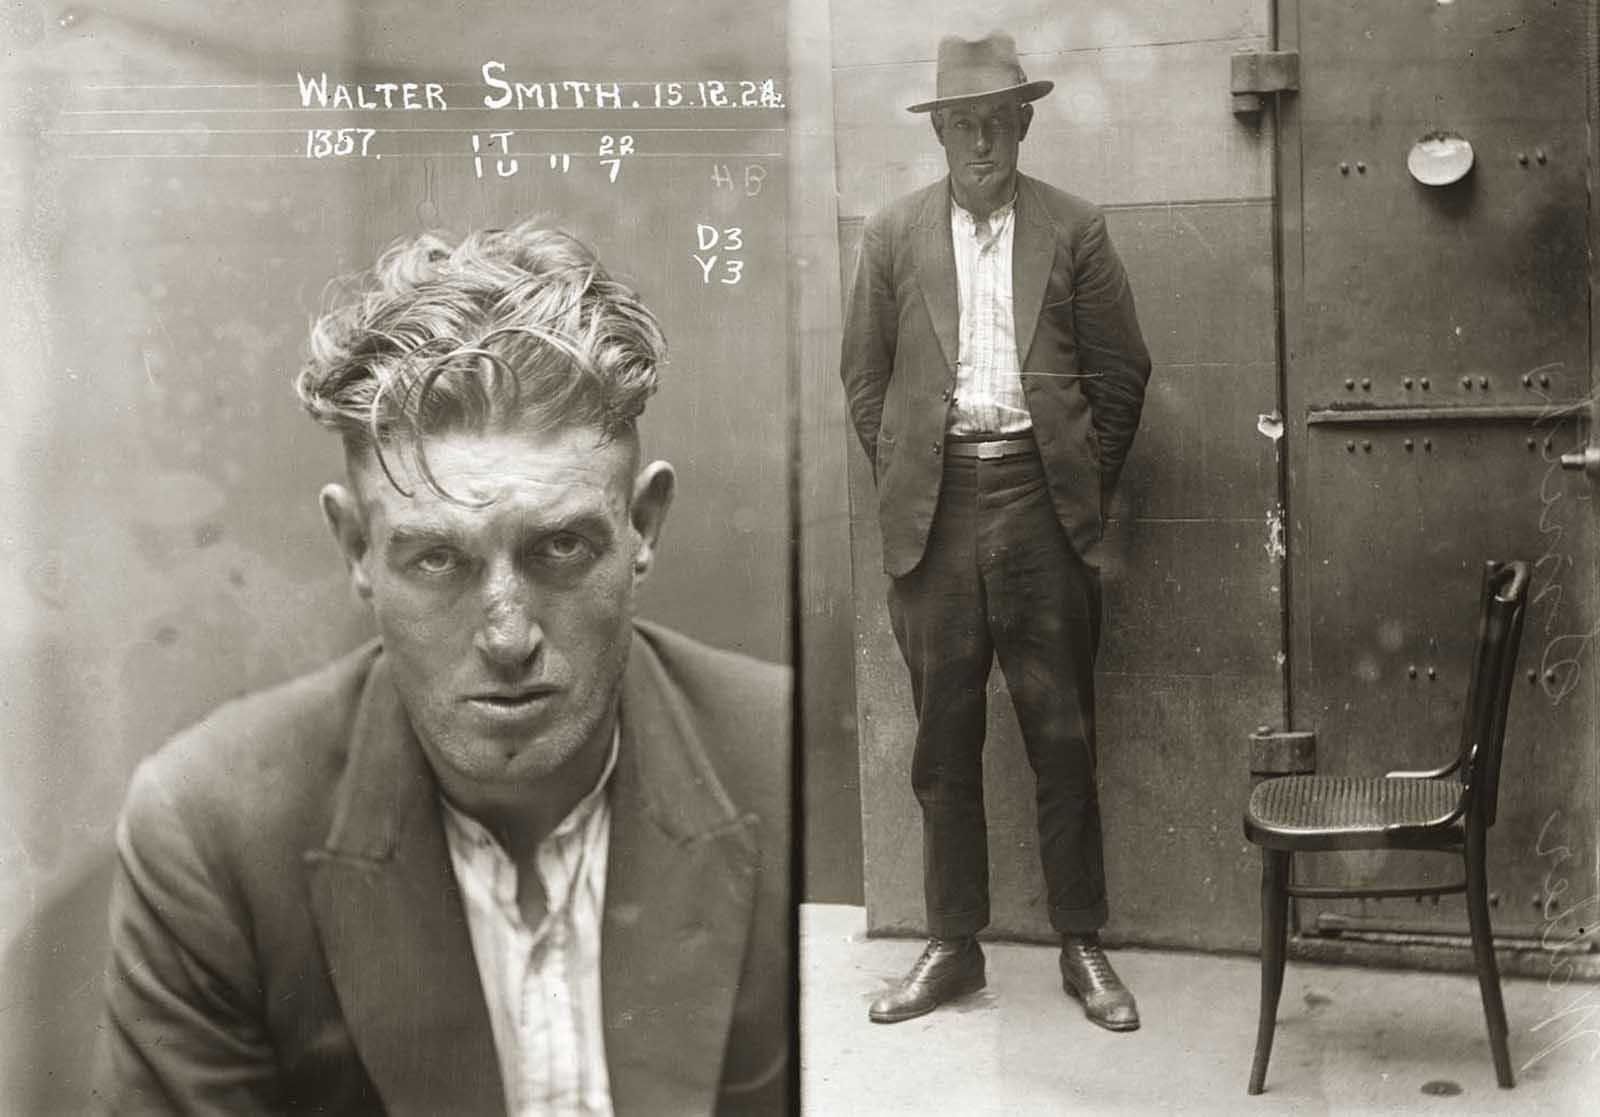 Walter Smith. 1924.